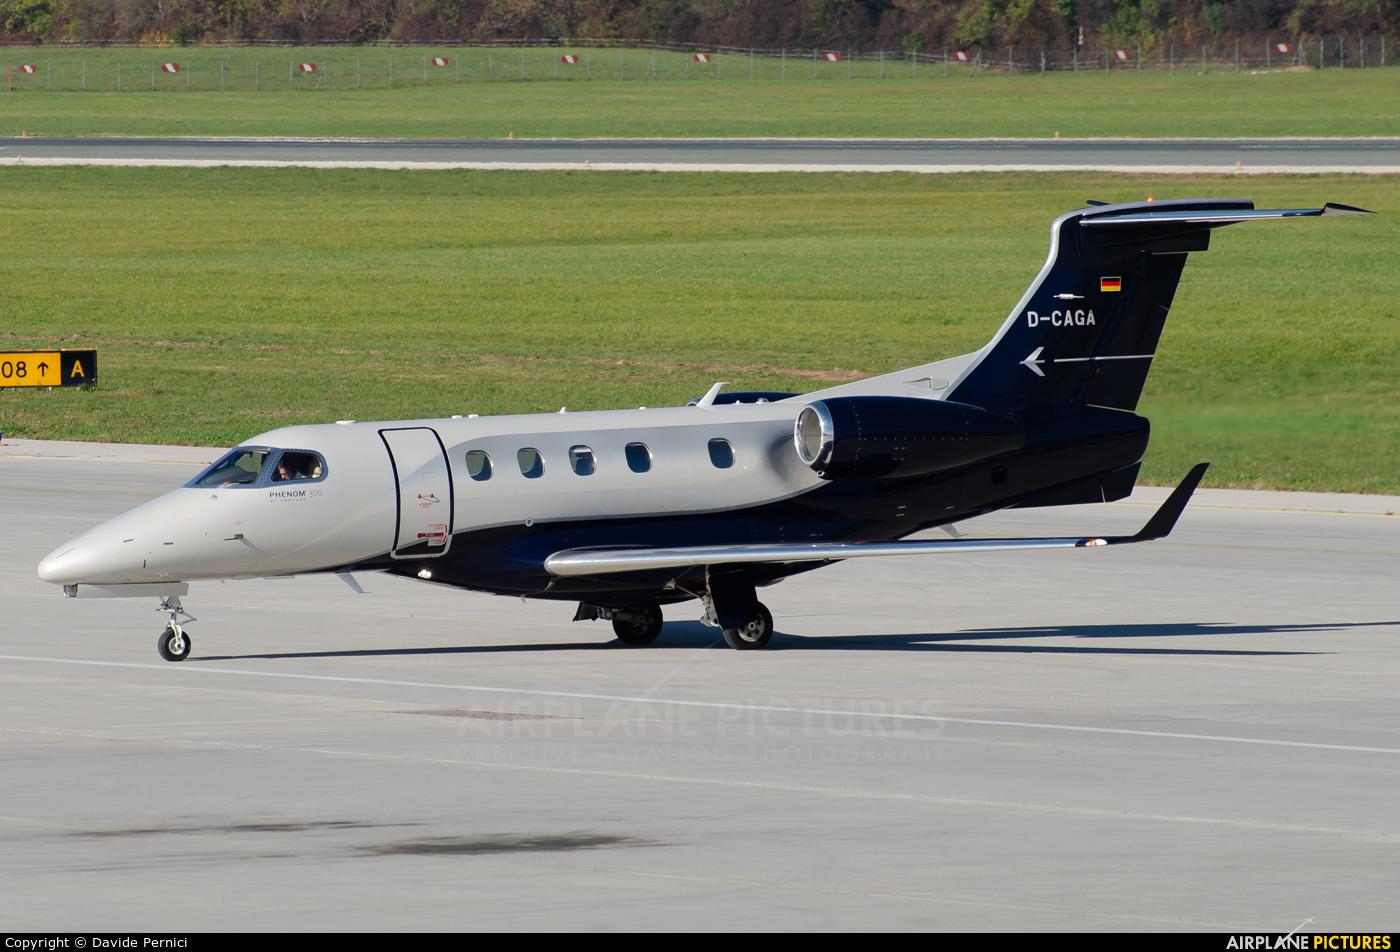 Private D-CAGA aircraft at Innsbruck